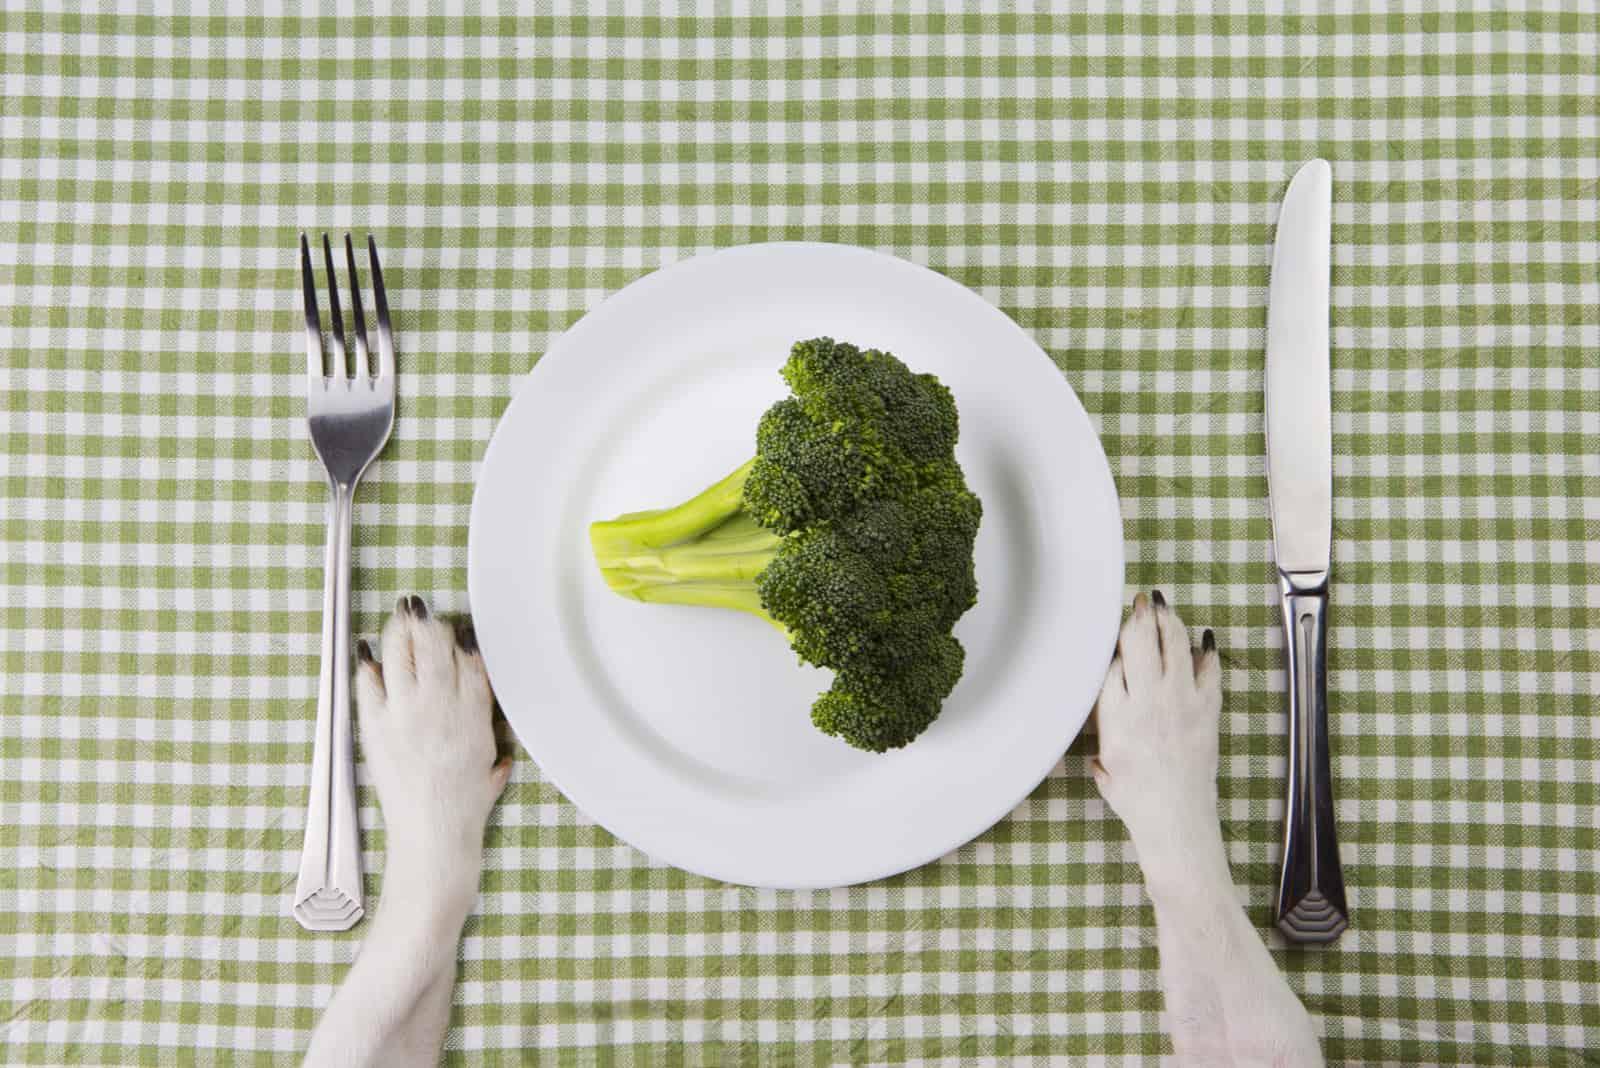 Teller Brokkoli. Gemüsediät.